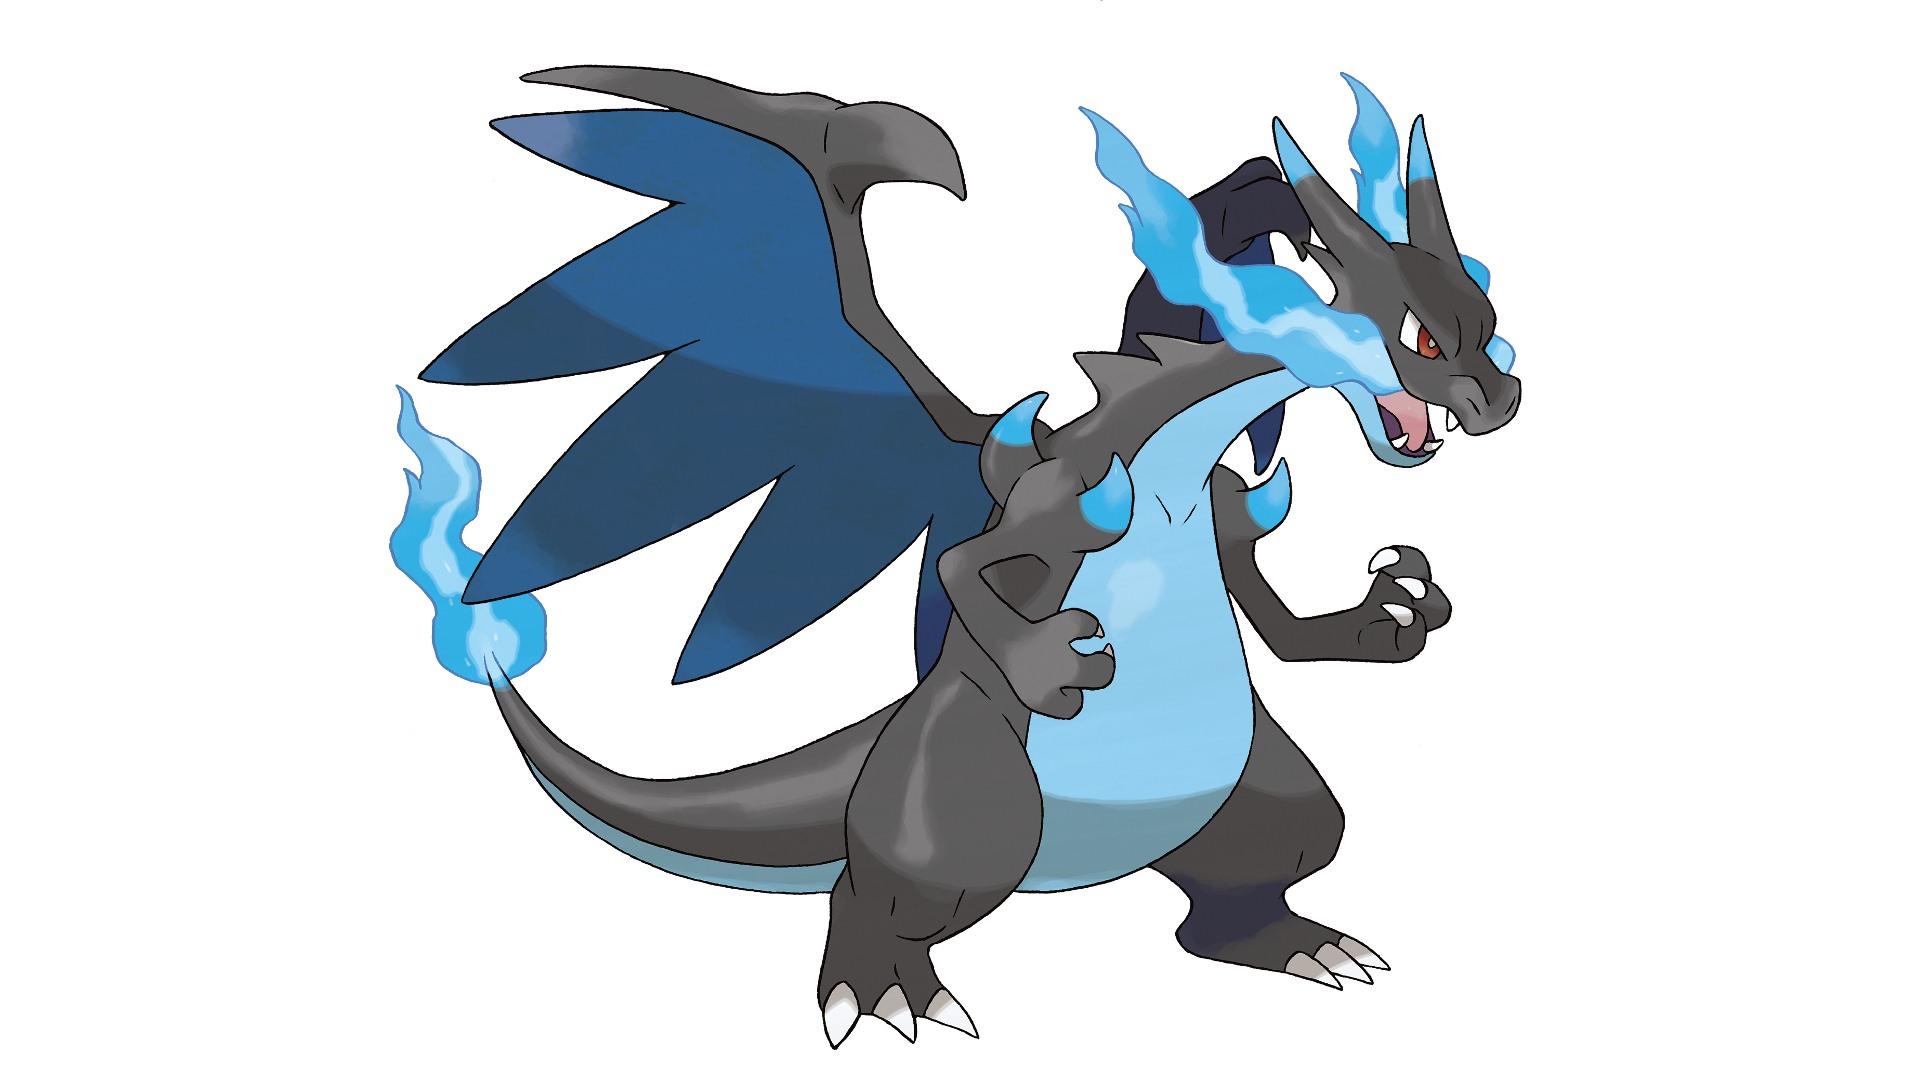 Pokemon X And Y Add Mega Charizard To Pokedex Alongside